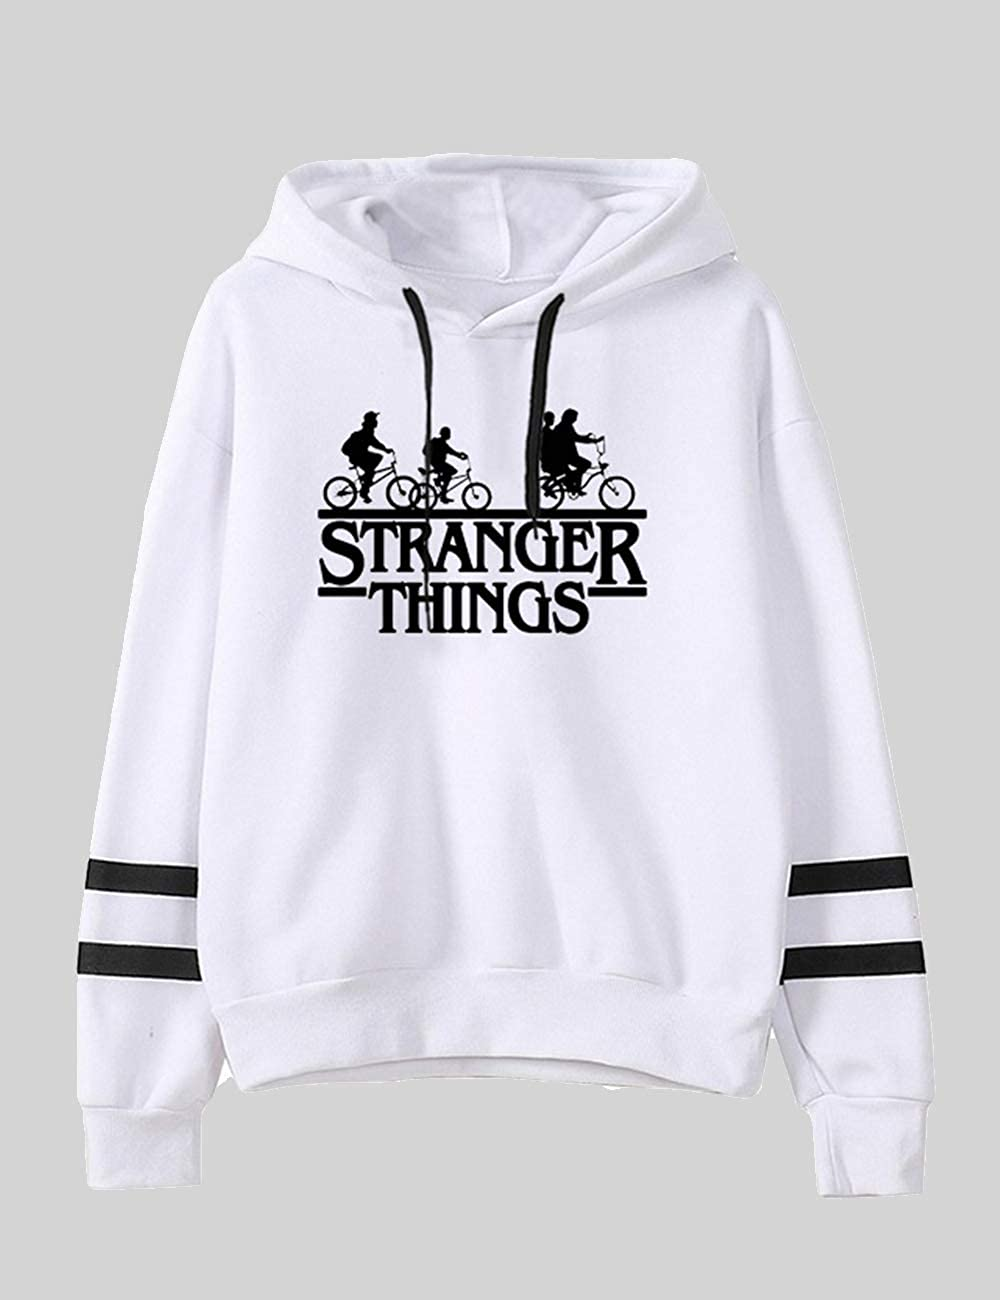 Sudadera Stranger Things Mujer con Capucha 3D Impresi/ón Manga Larga de Invierno Ropa Unisex Sweatshirt Abecedario Impresi/ón Regalo Raya de b/éisbol Sudadera Stranger Things Hombre